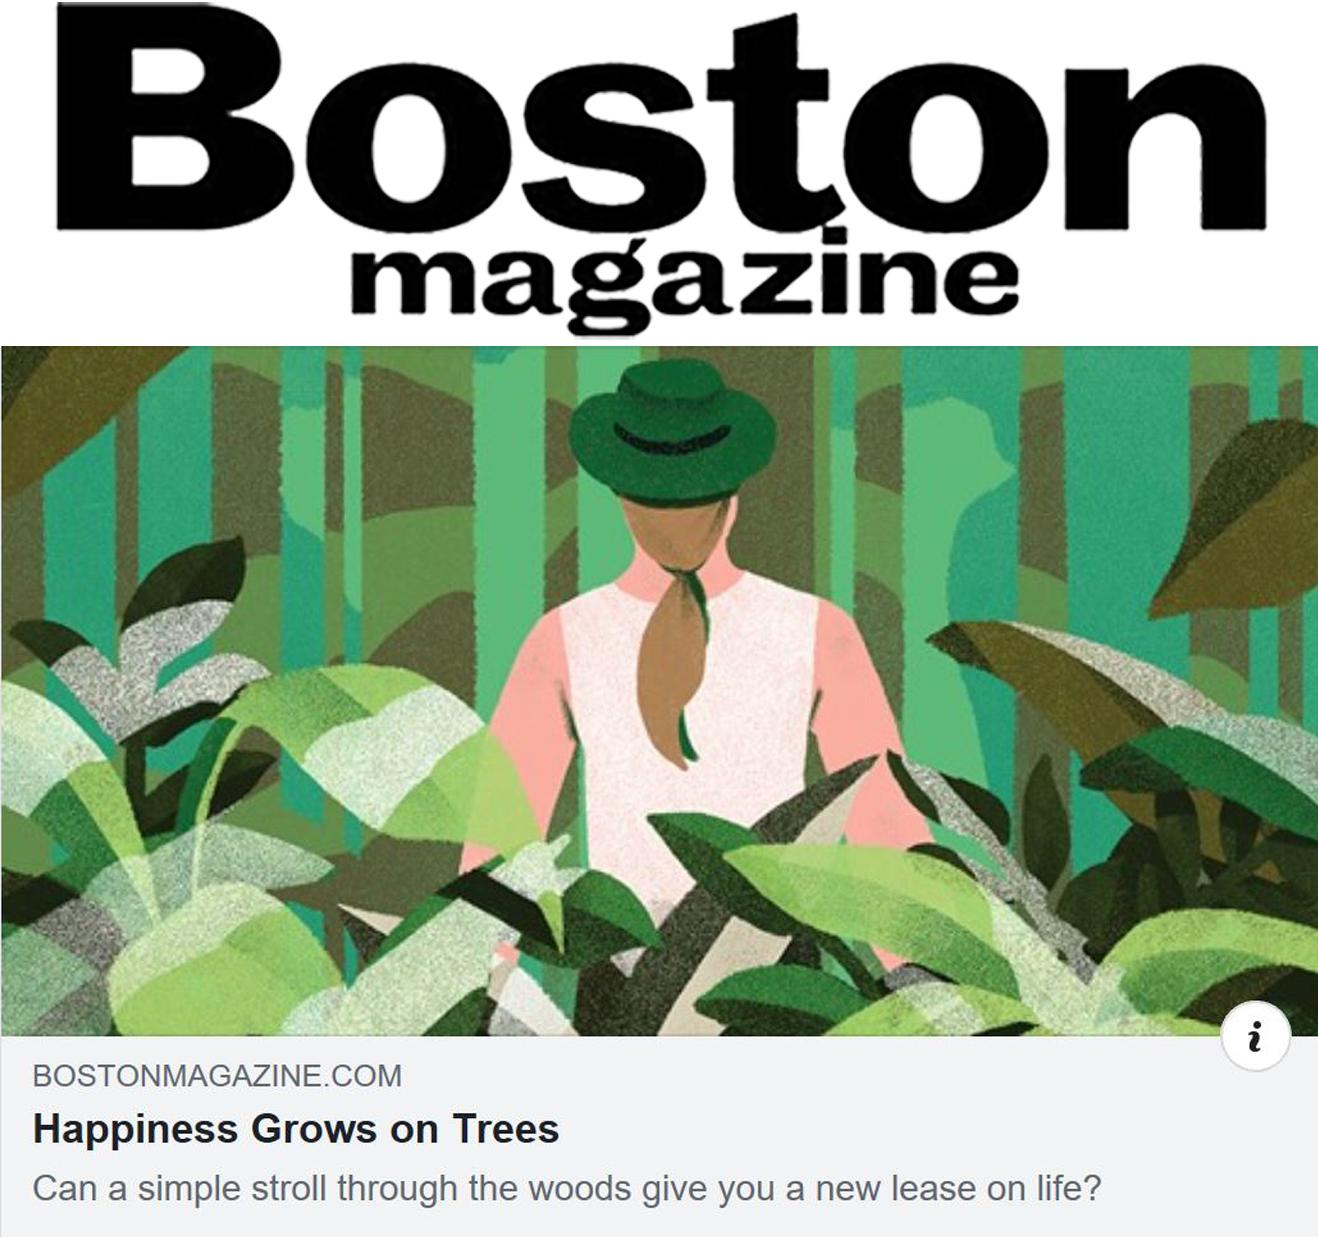 Boston-Magazine-article.jpg